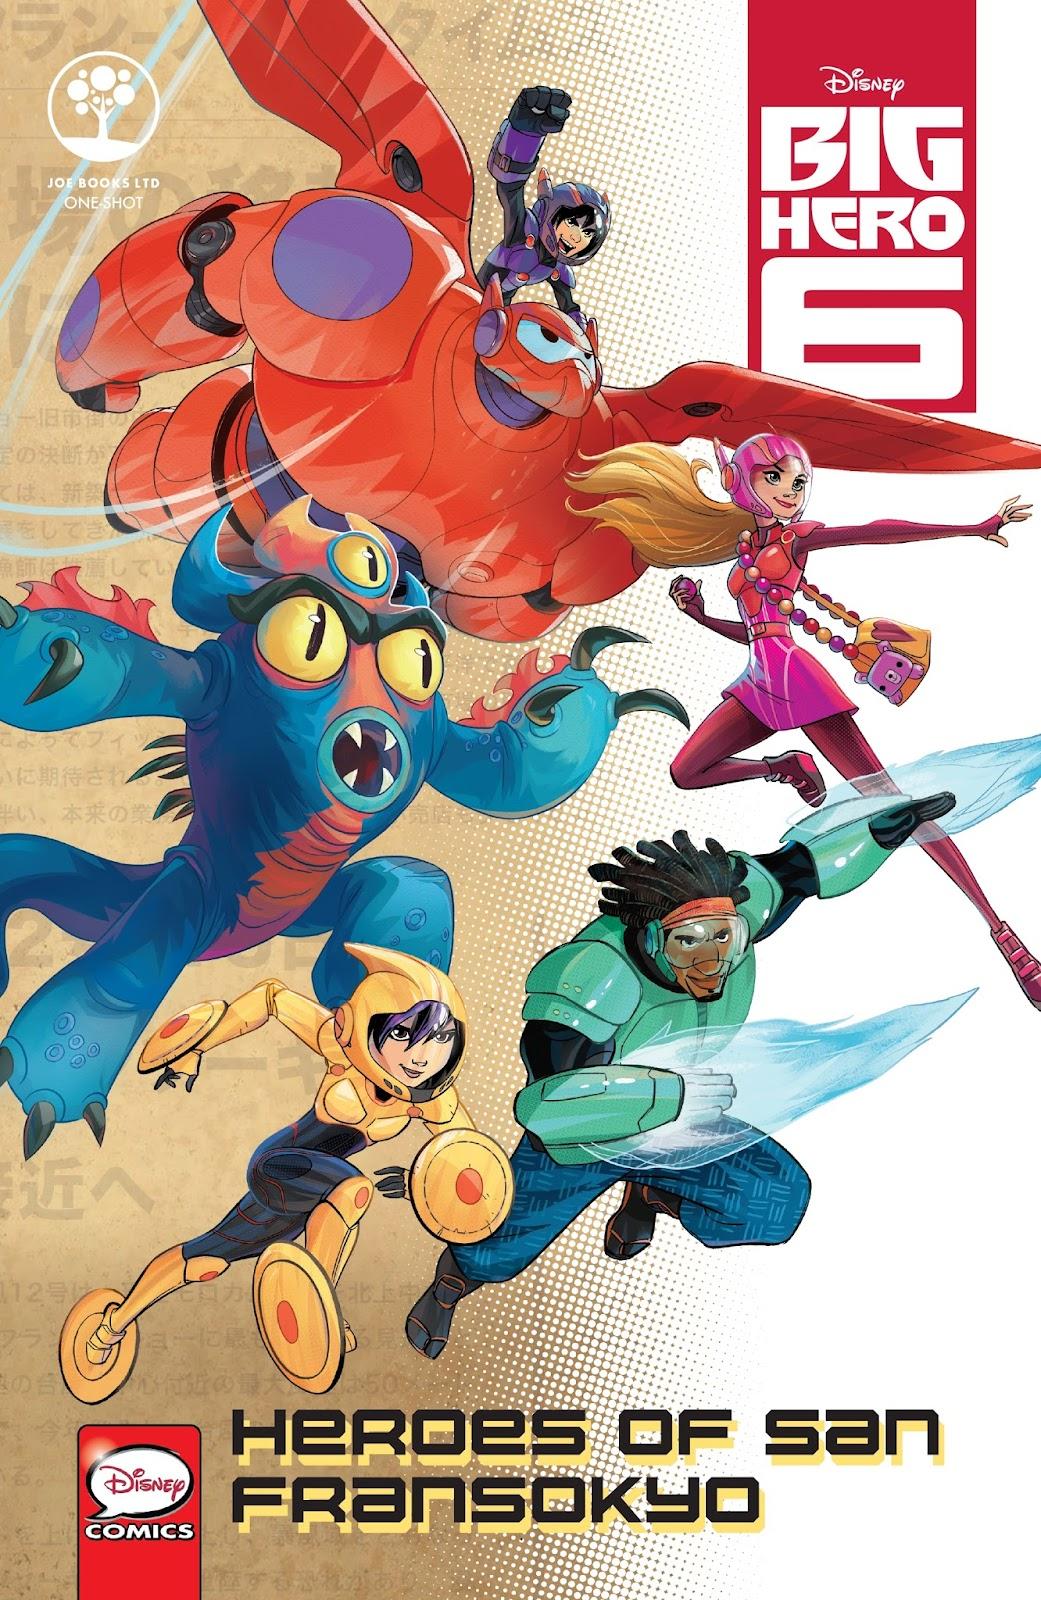 Big Hero Comic comic disney big hero 6: heroes of san fransokyo issue 1